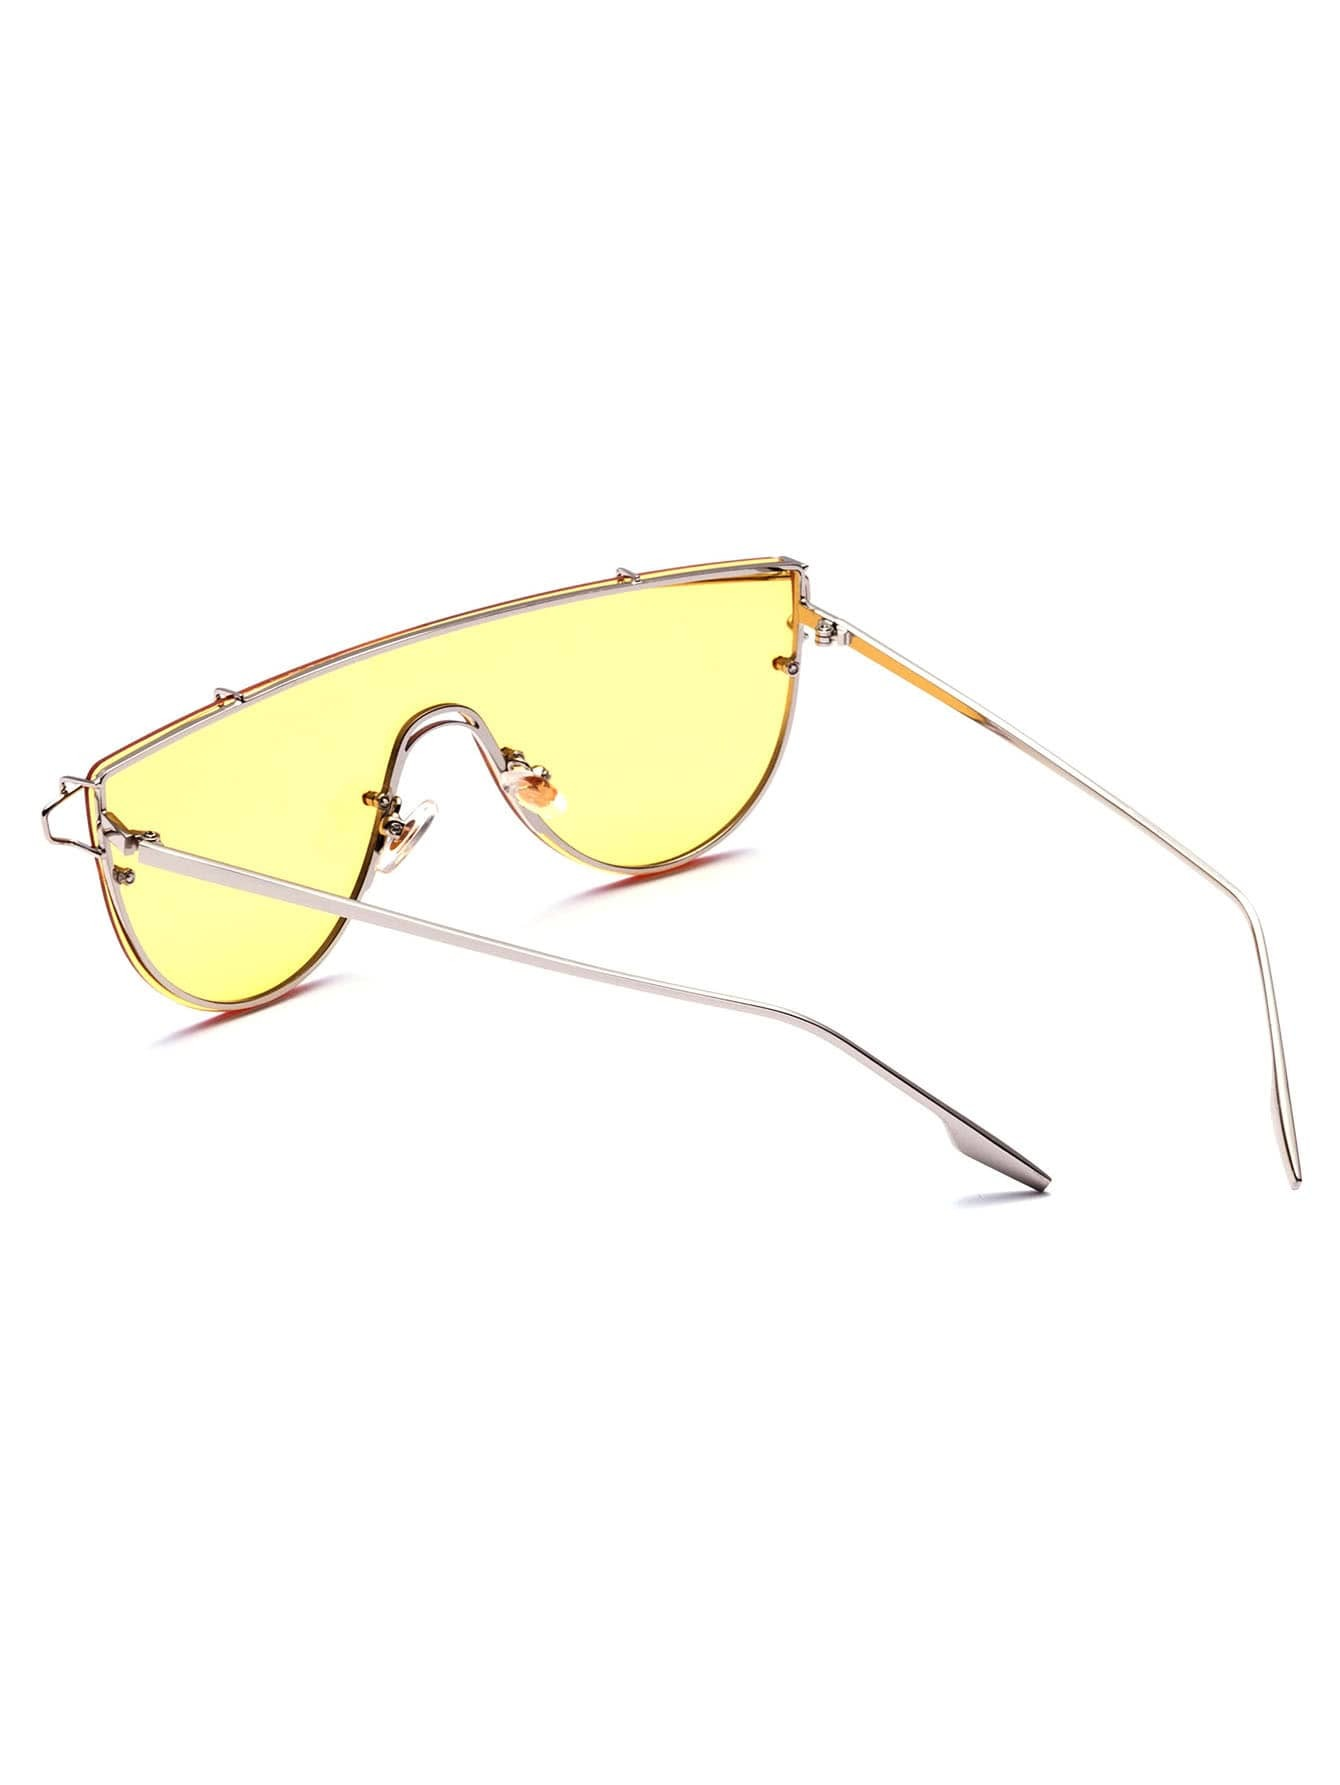 sunglass170102304_2